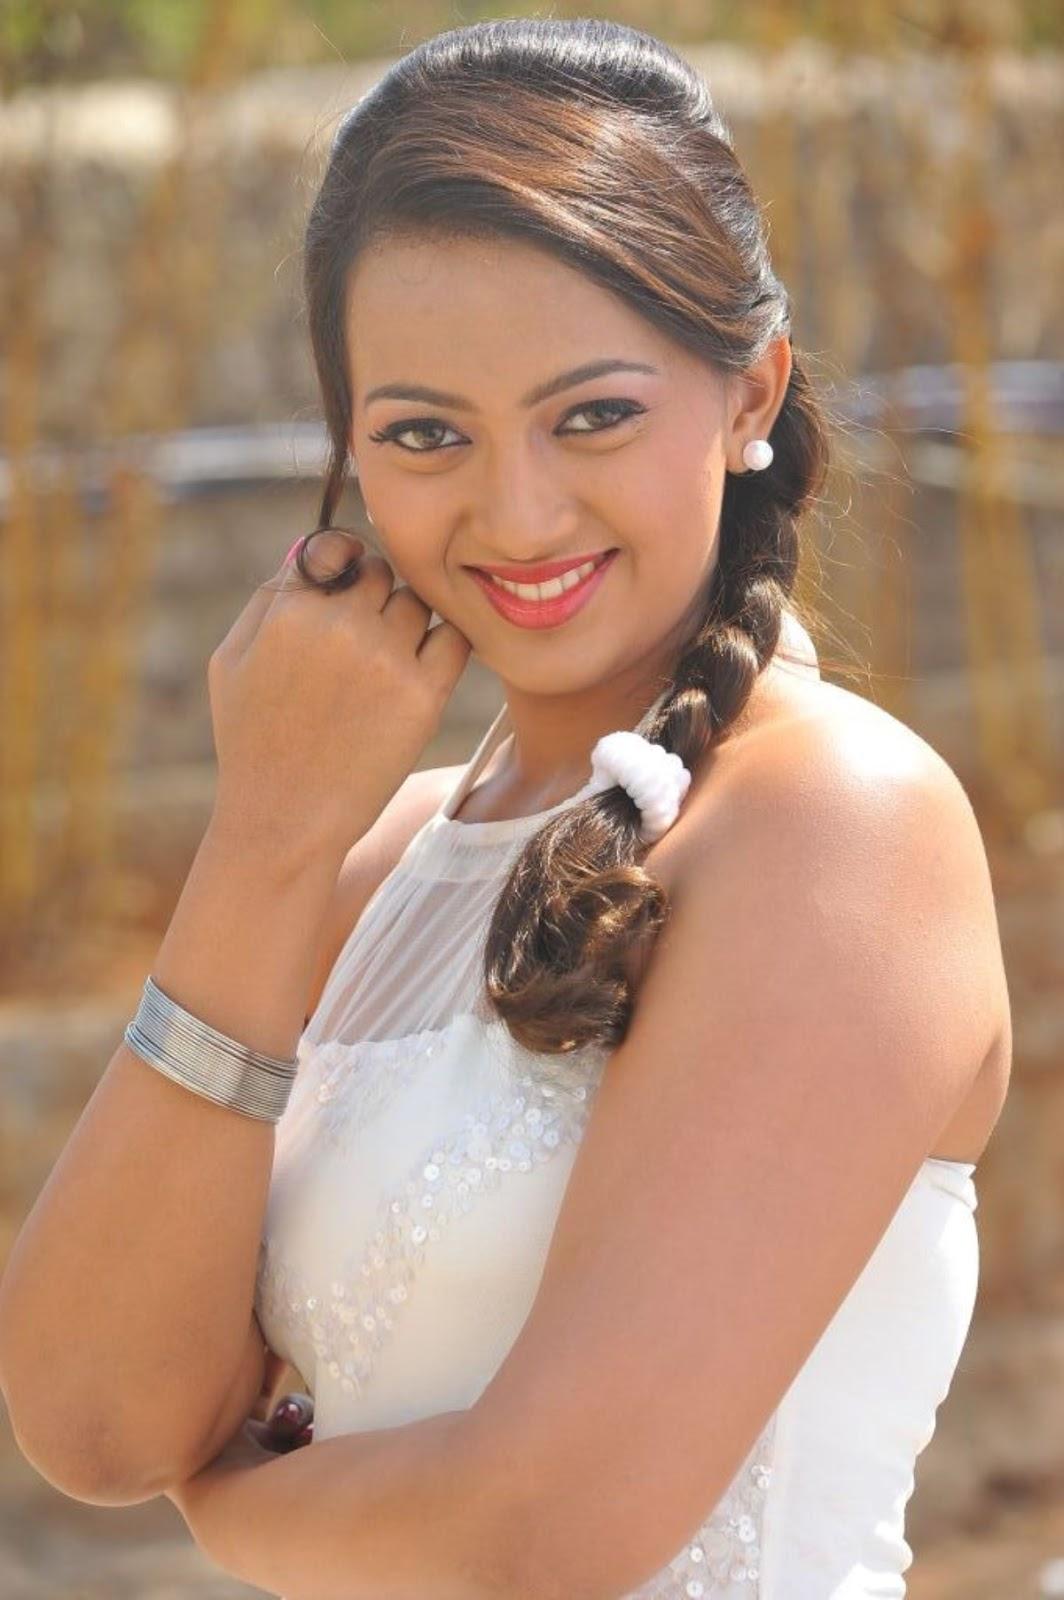 Telugu Actress Ester Noronha High Quality Stills | NETTV4U